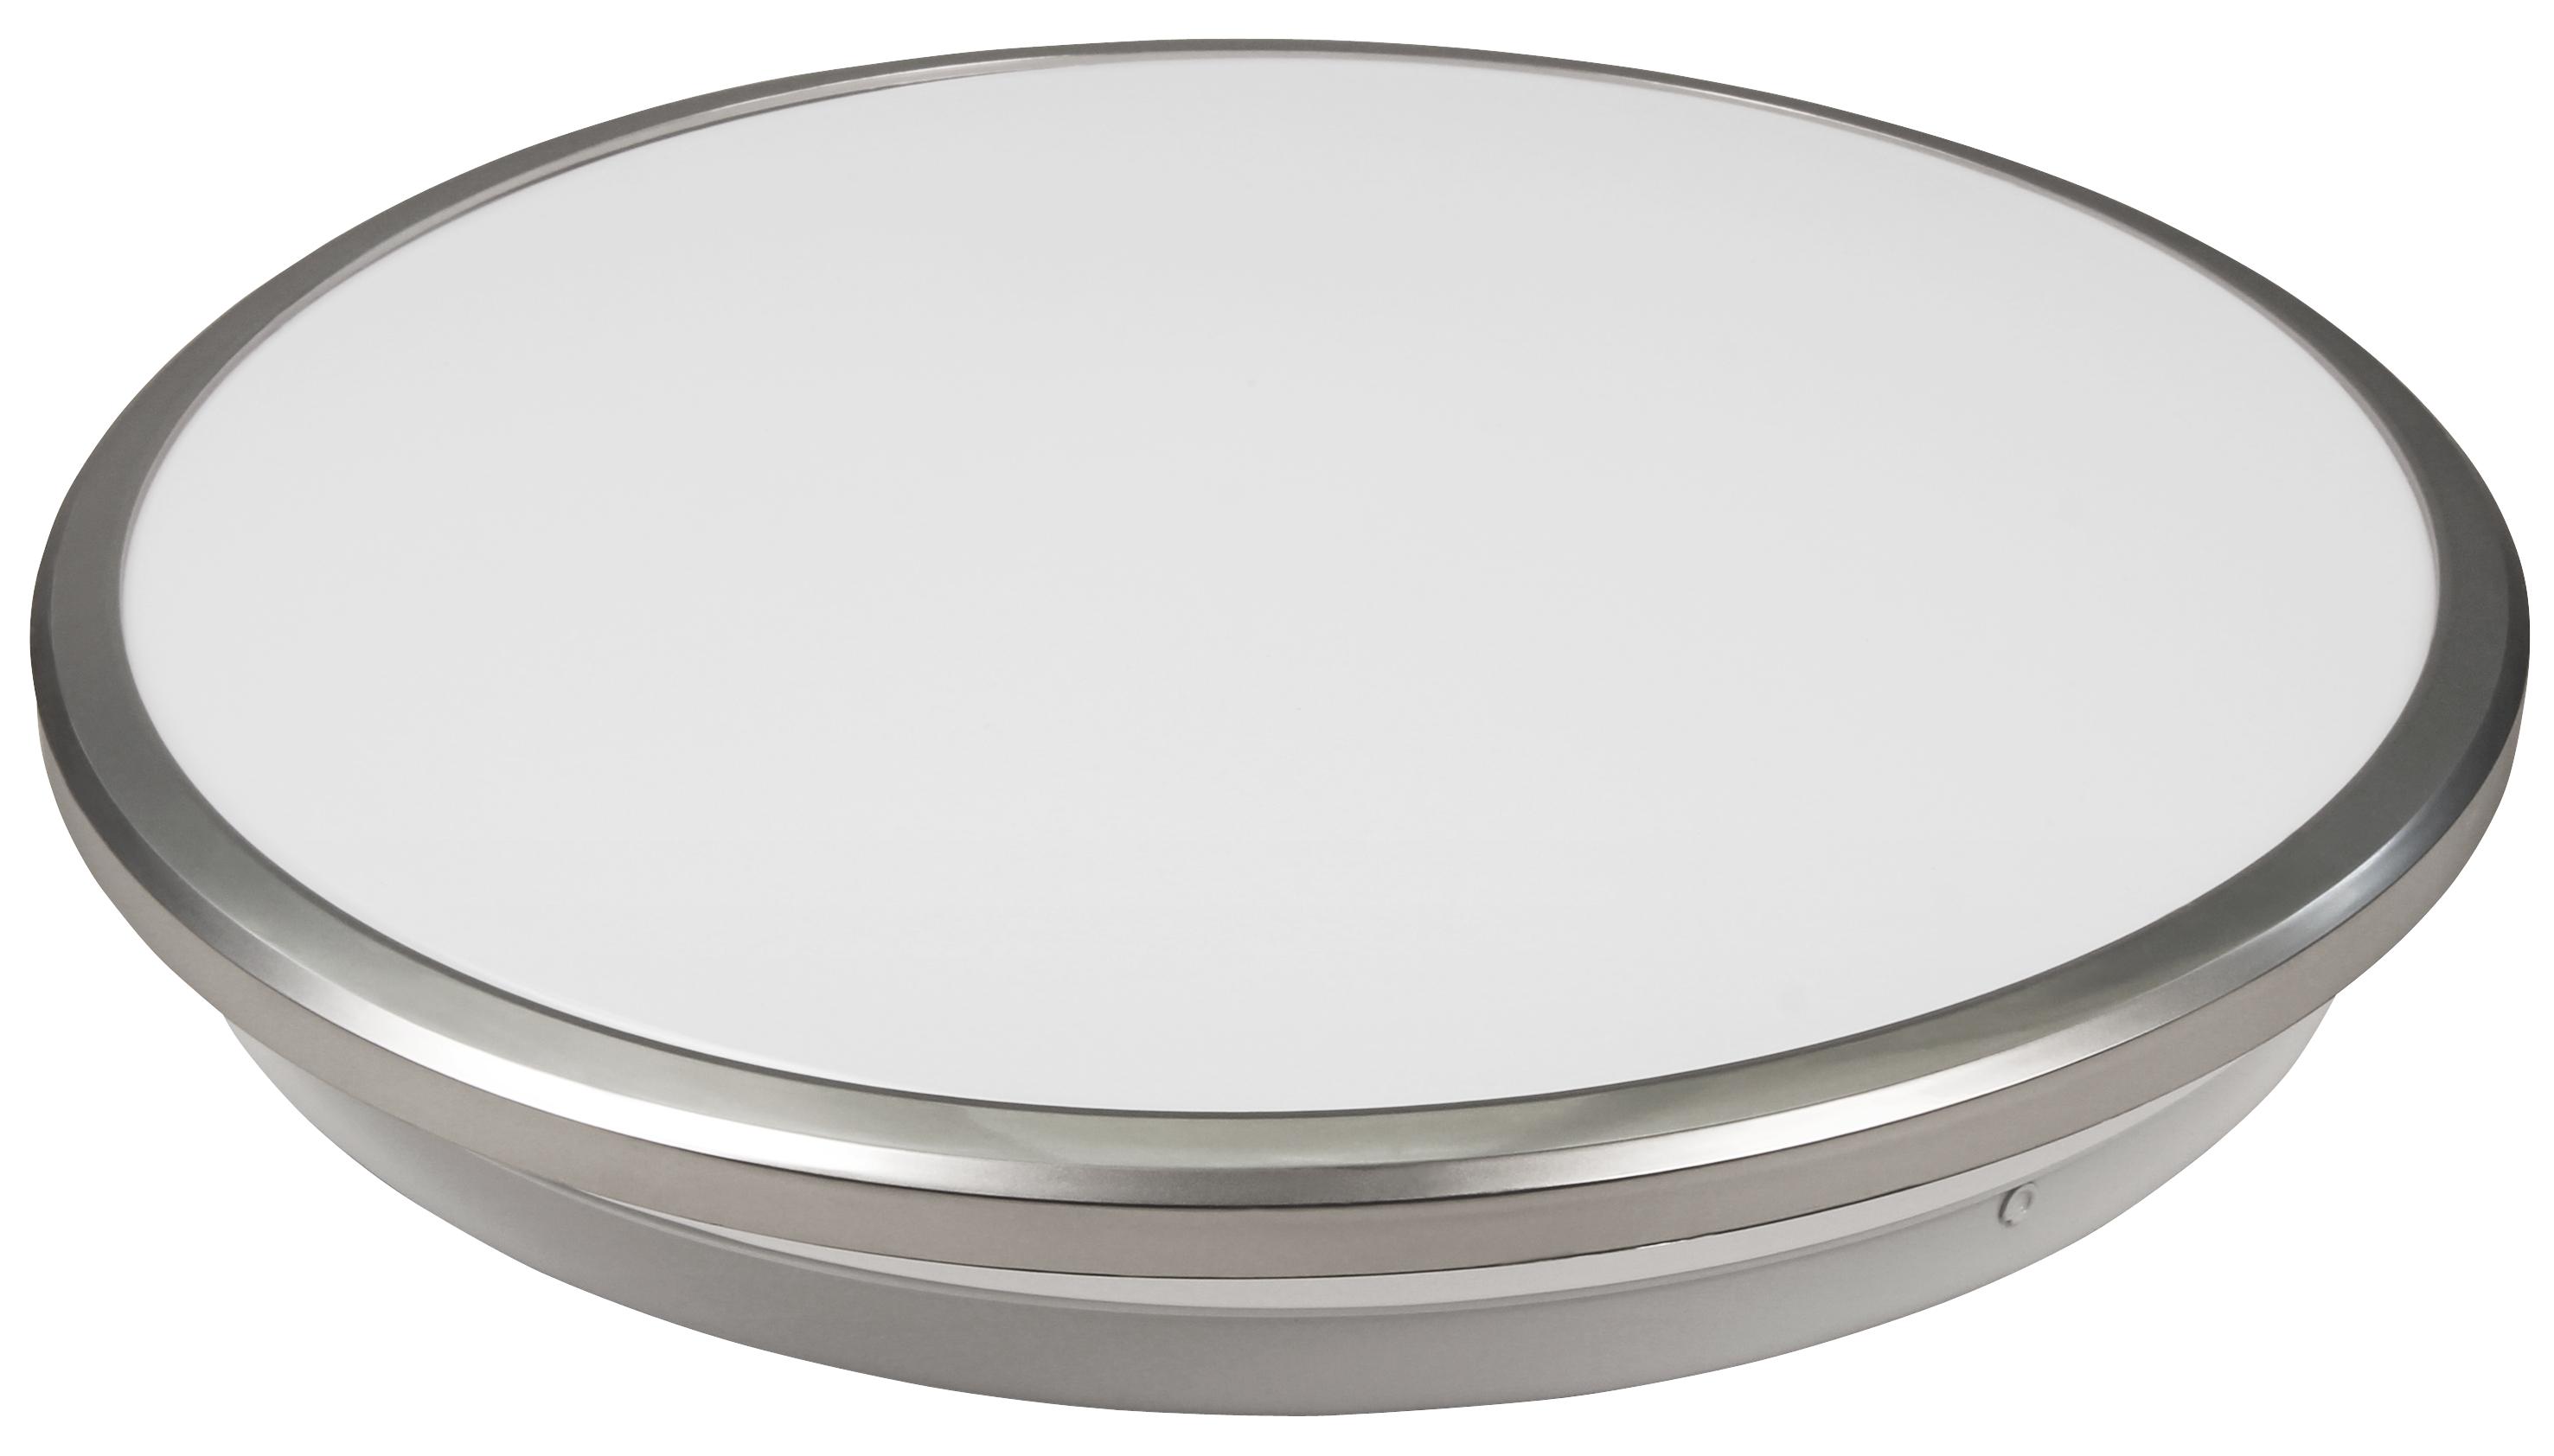 LED-Deckenleuchte McShine ''Sunny'', 27cm-Ø, 12W, 960lm, 3000K, warmweiß